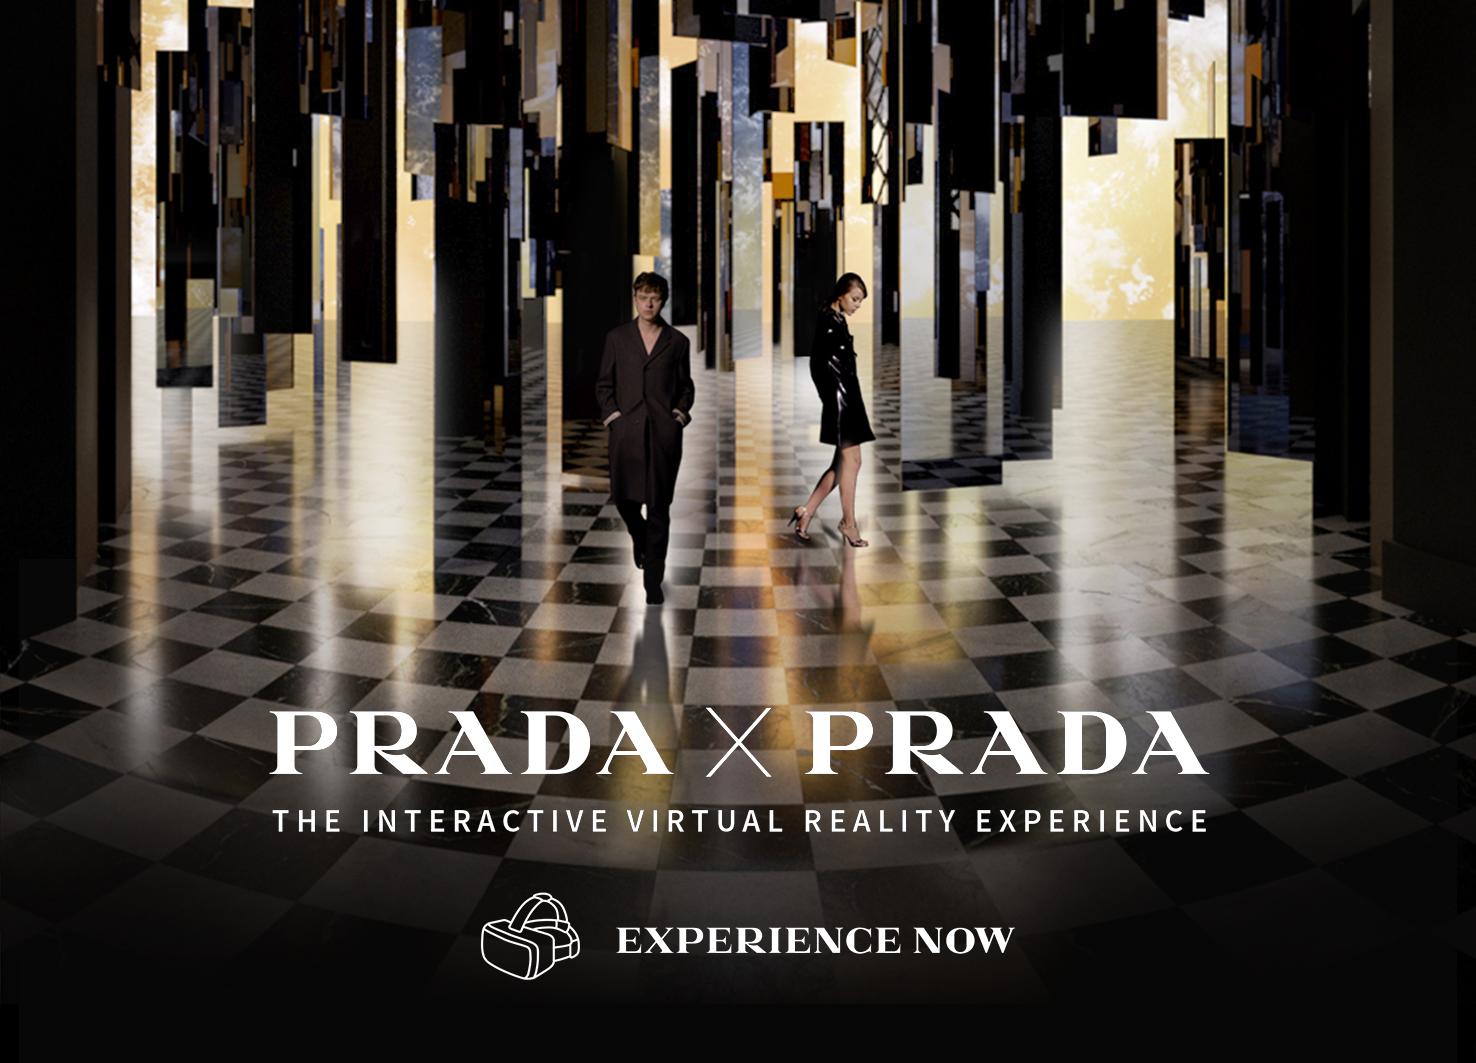 Prada realite virtuelle